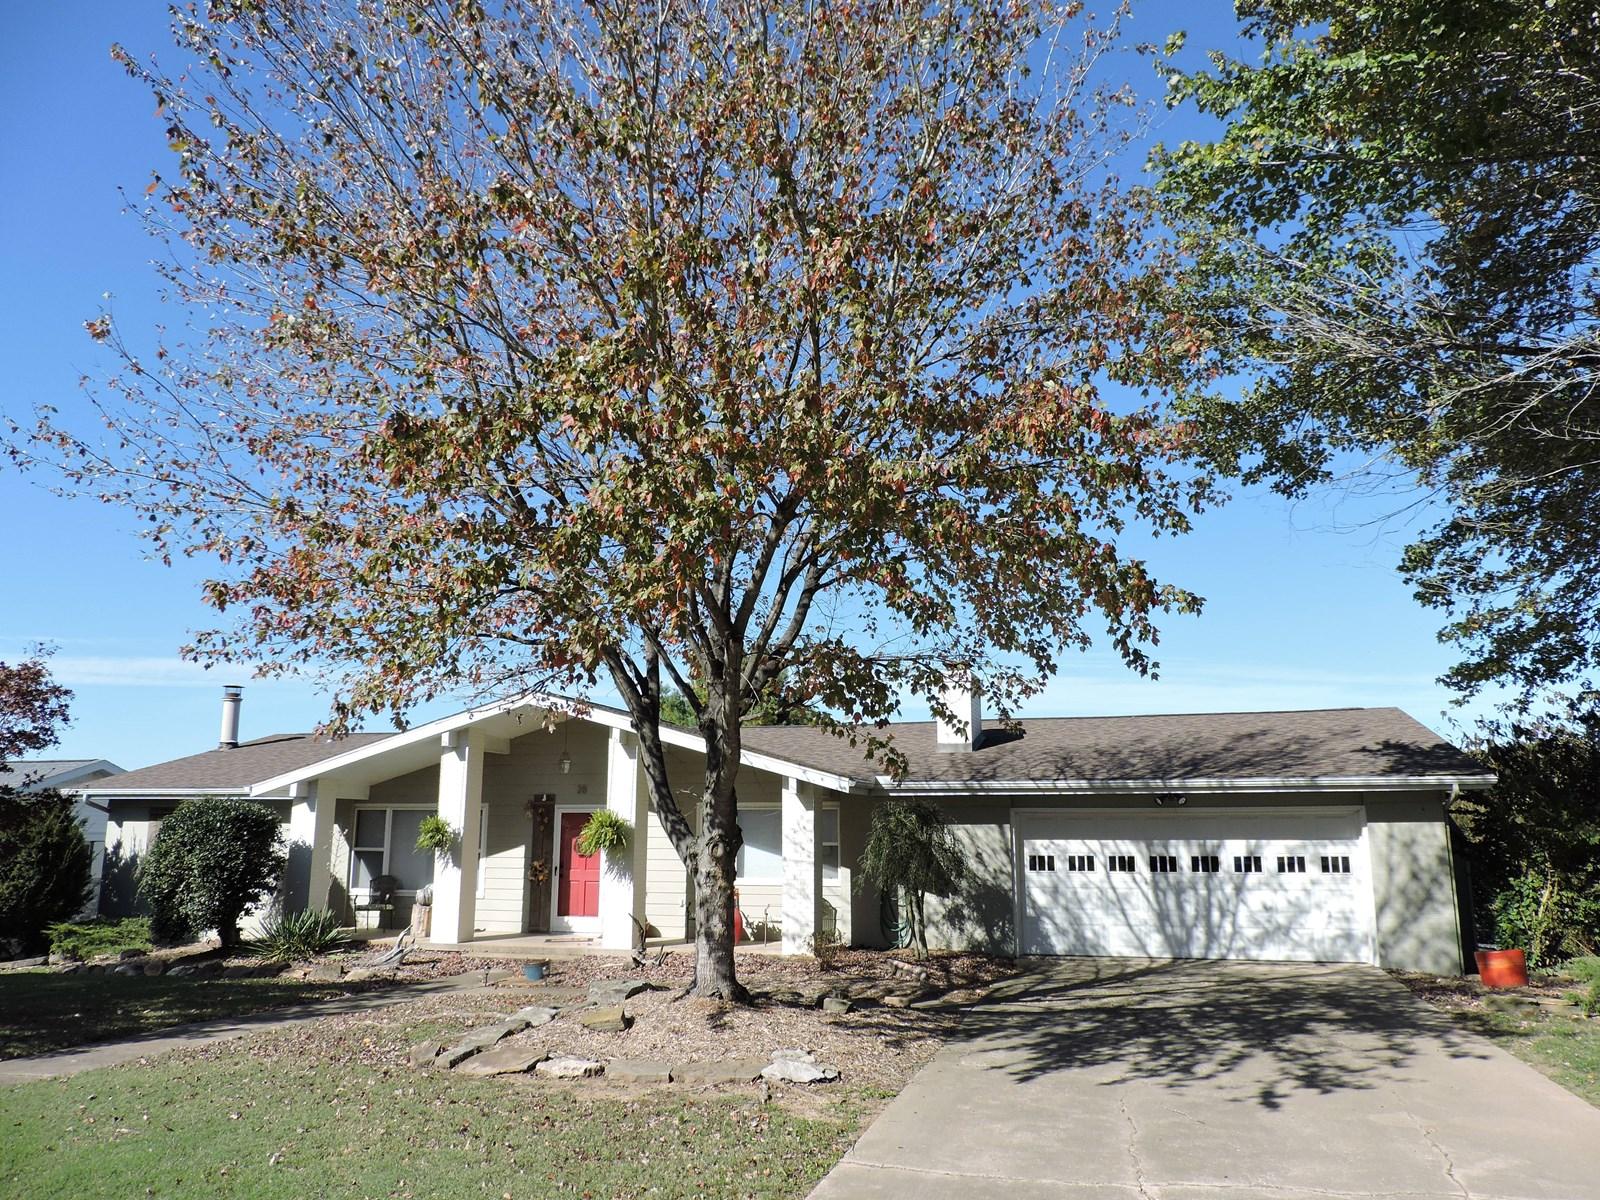 Brick Home in Popular Harrison, Ar Neighborhood